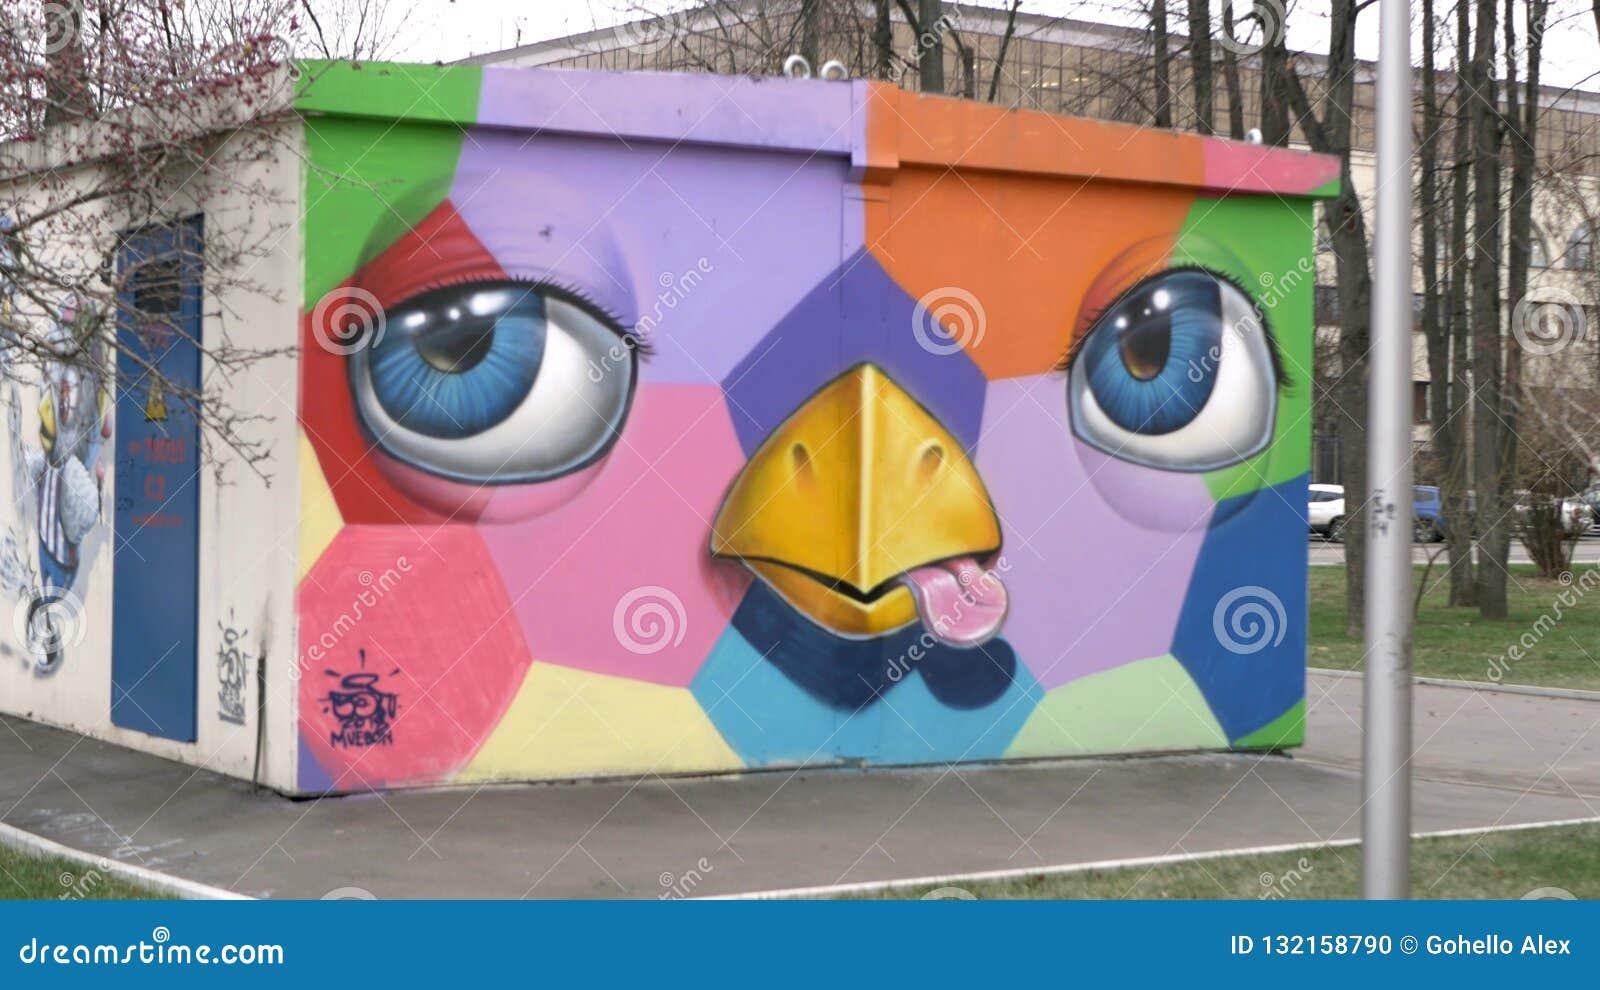 graffiti szalagok)